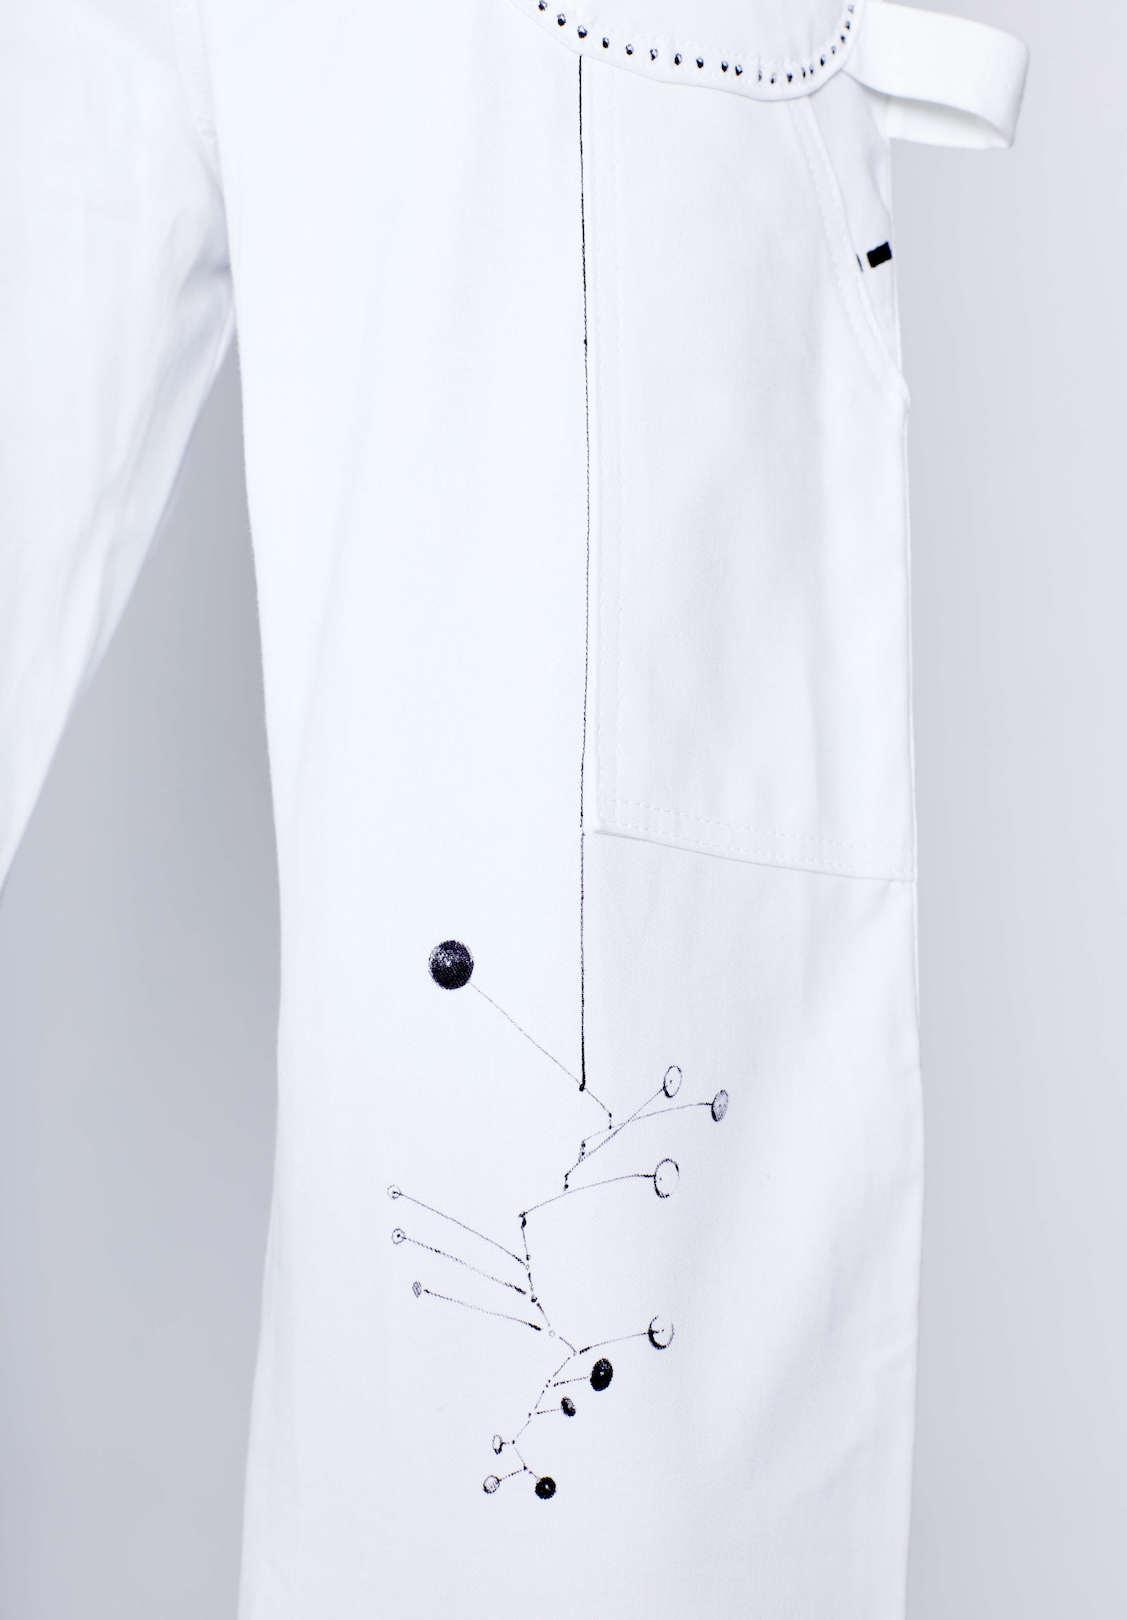 Detail view of Michael Portait Pant by Natasha Blodgett featuring Calder Mobile